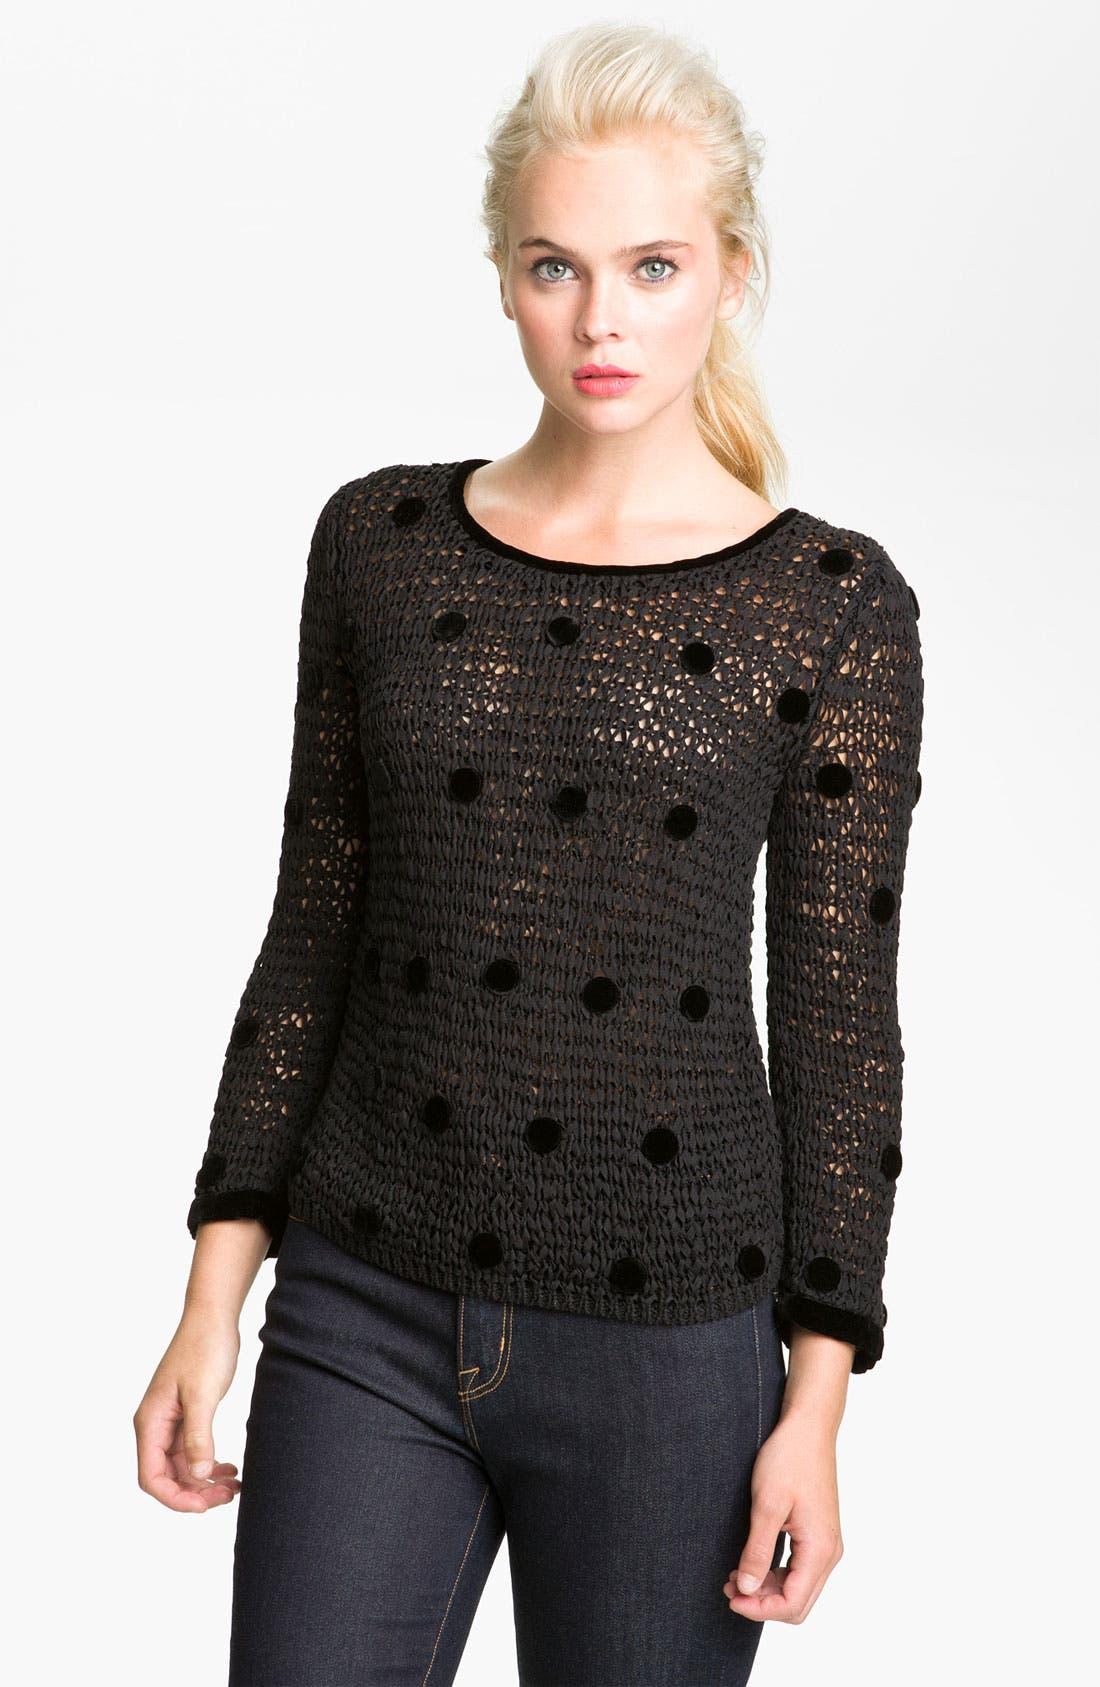 Main Image - MARC BY MARC JACOBS 'Koyla' Polka Dot Sweater